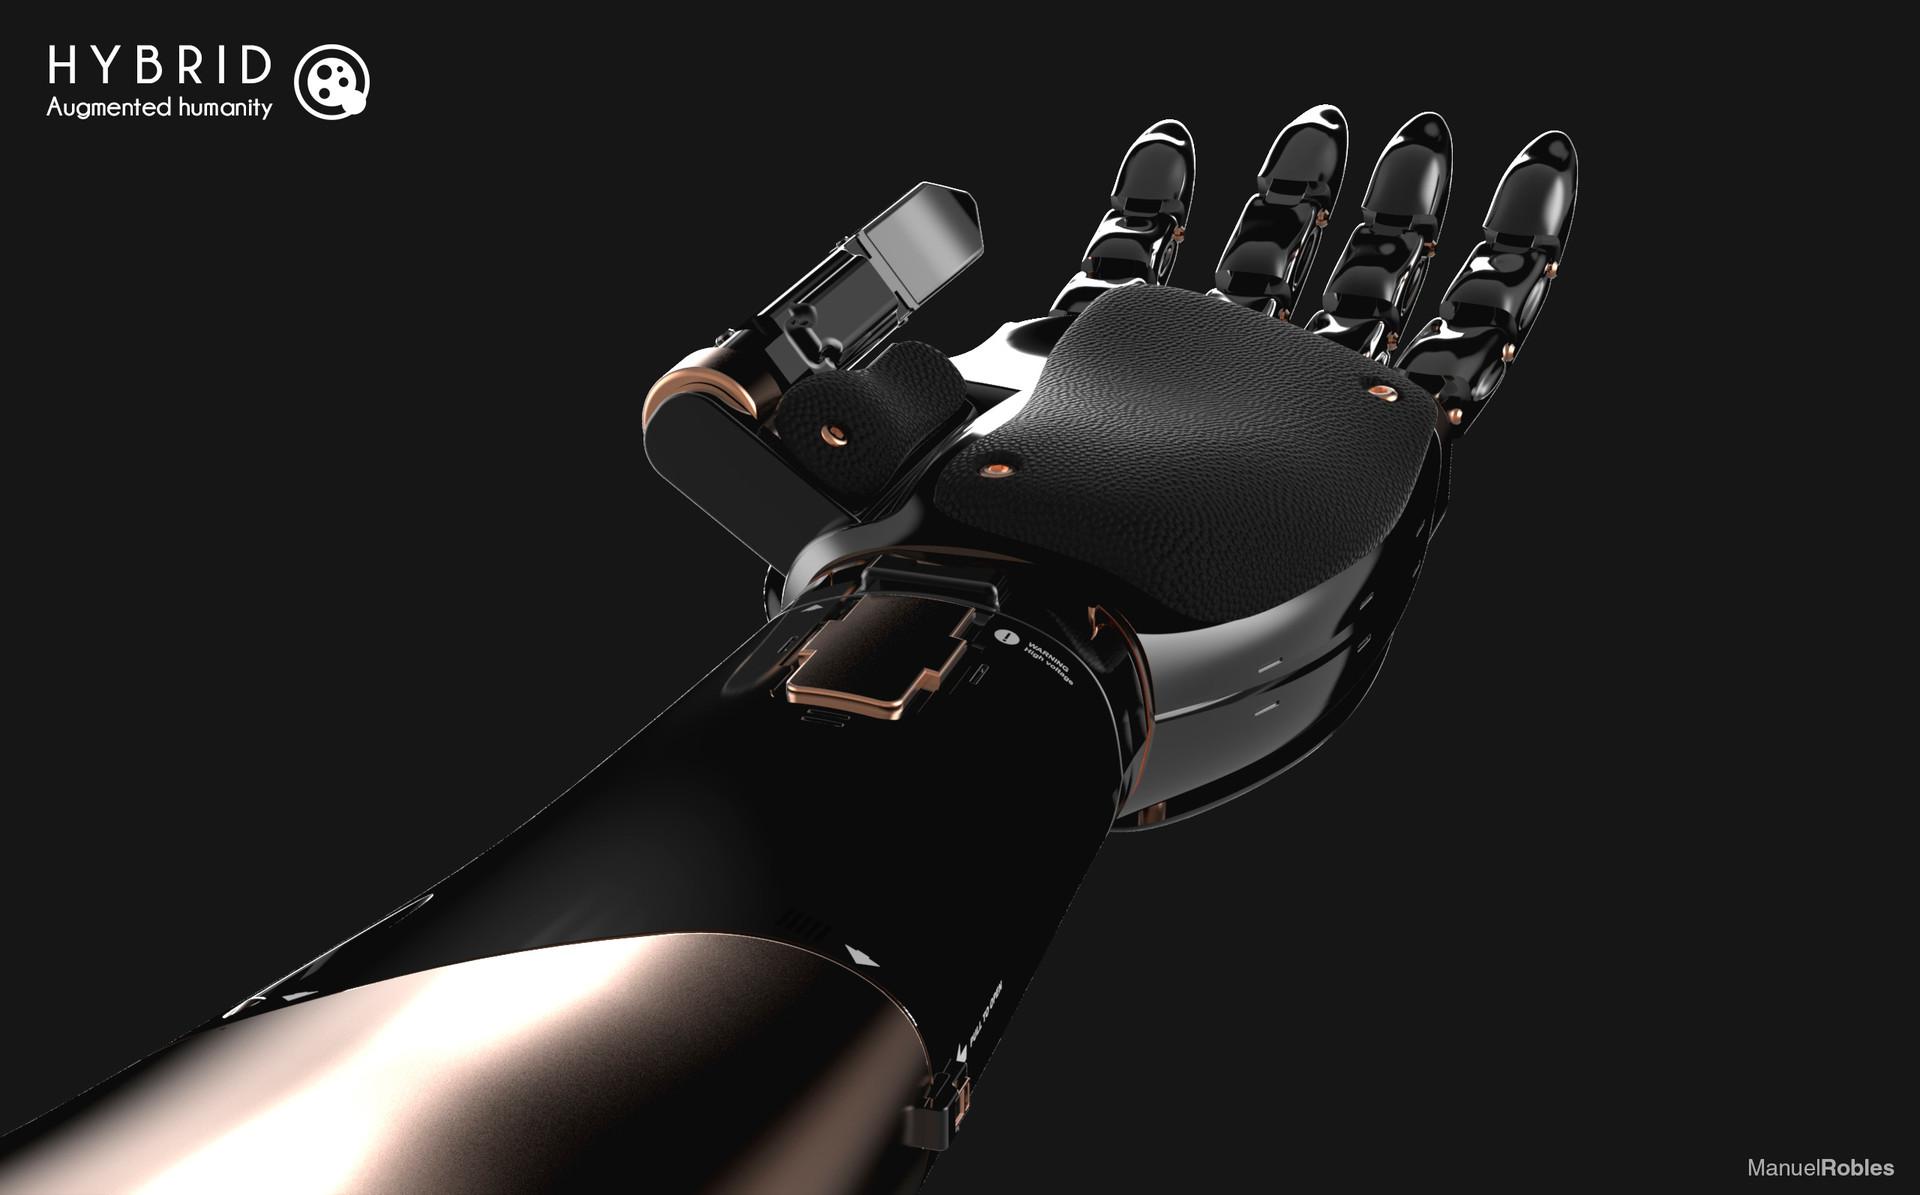 Manuel robles robot arm keyshot 06